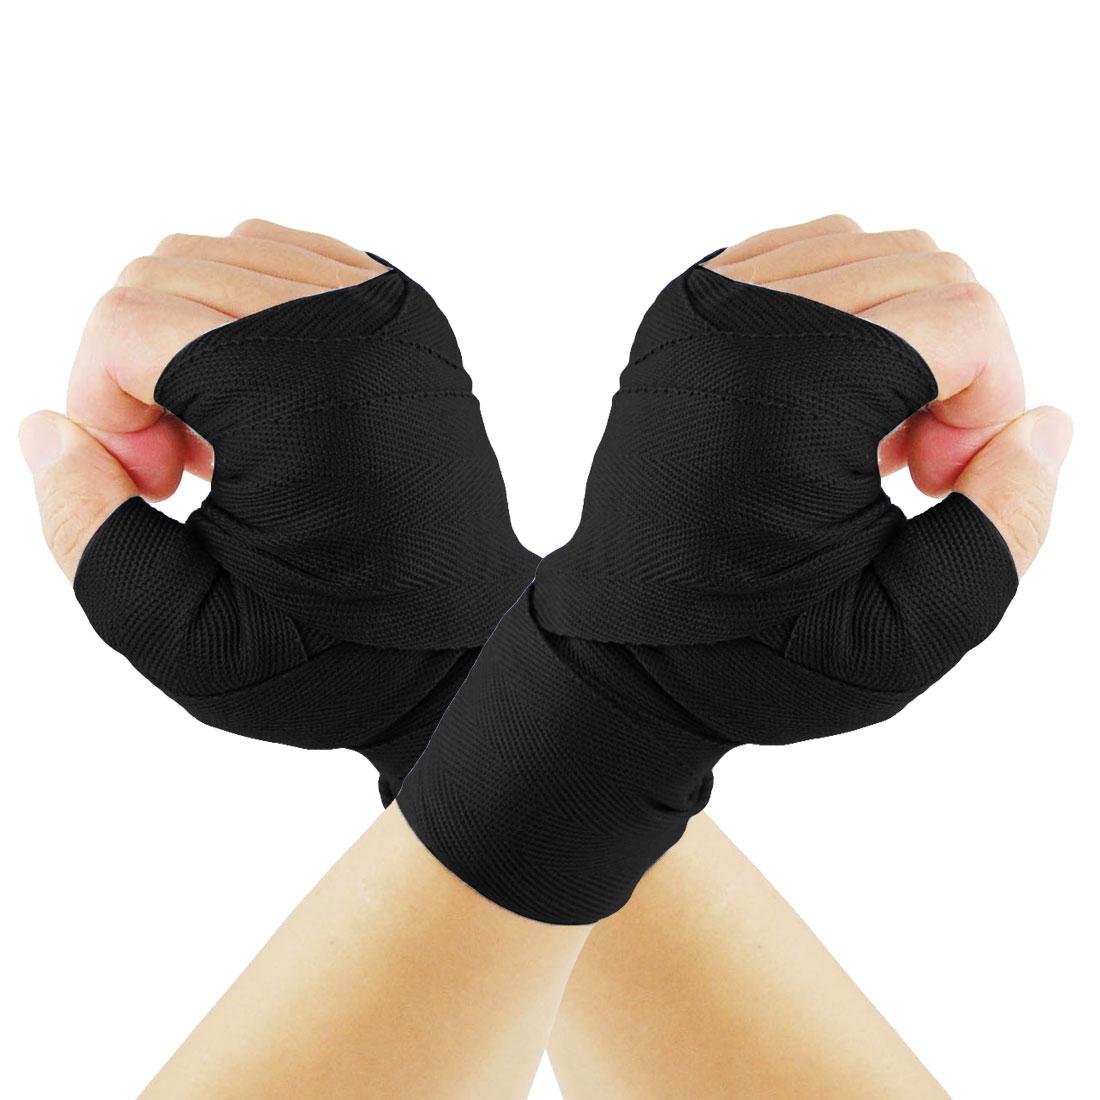 Hook Loop Fastener Black Cotten Boxing Hand Wraps Bandages Pair